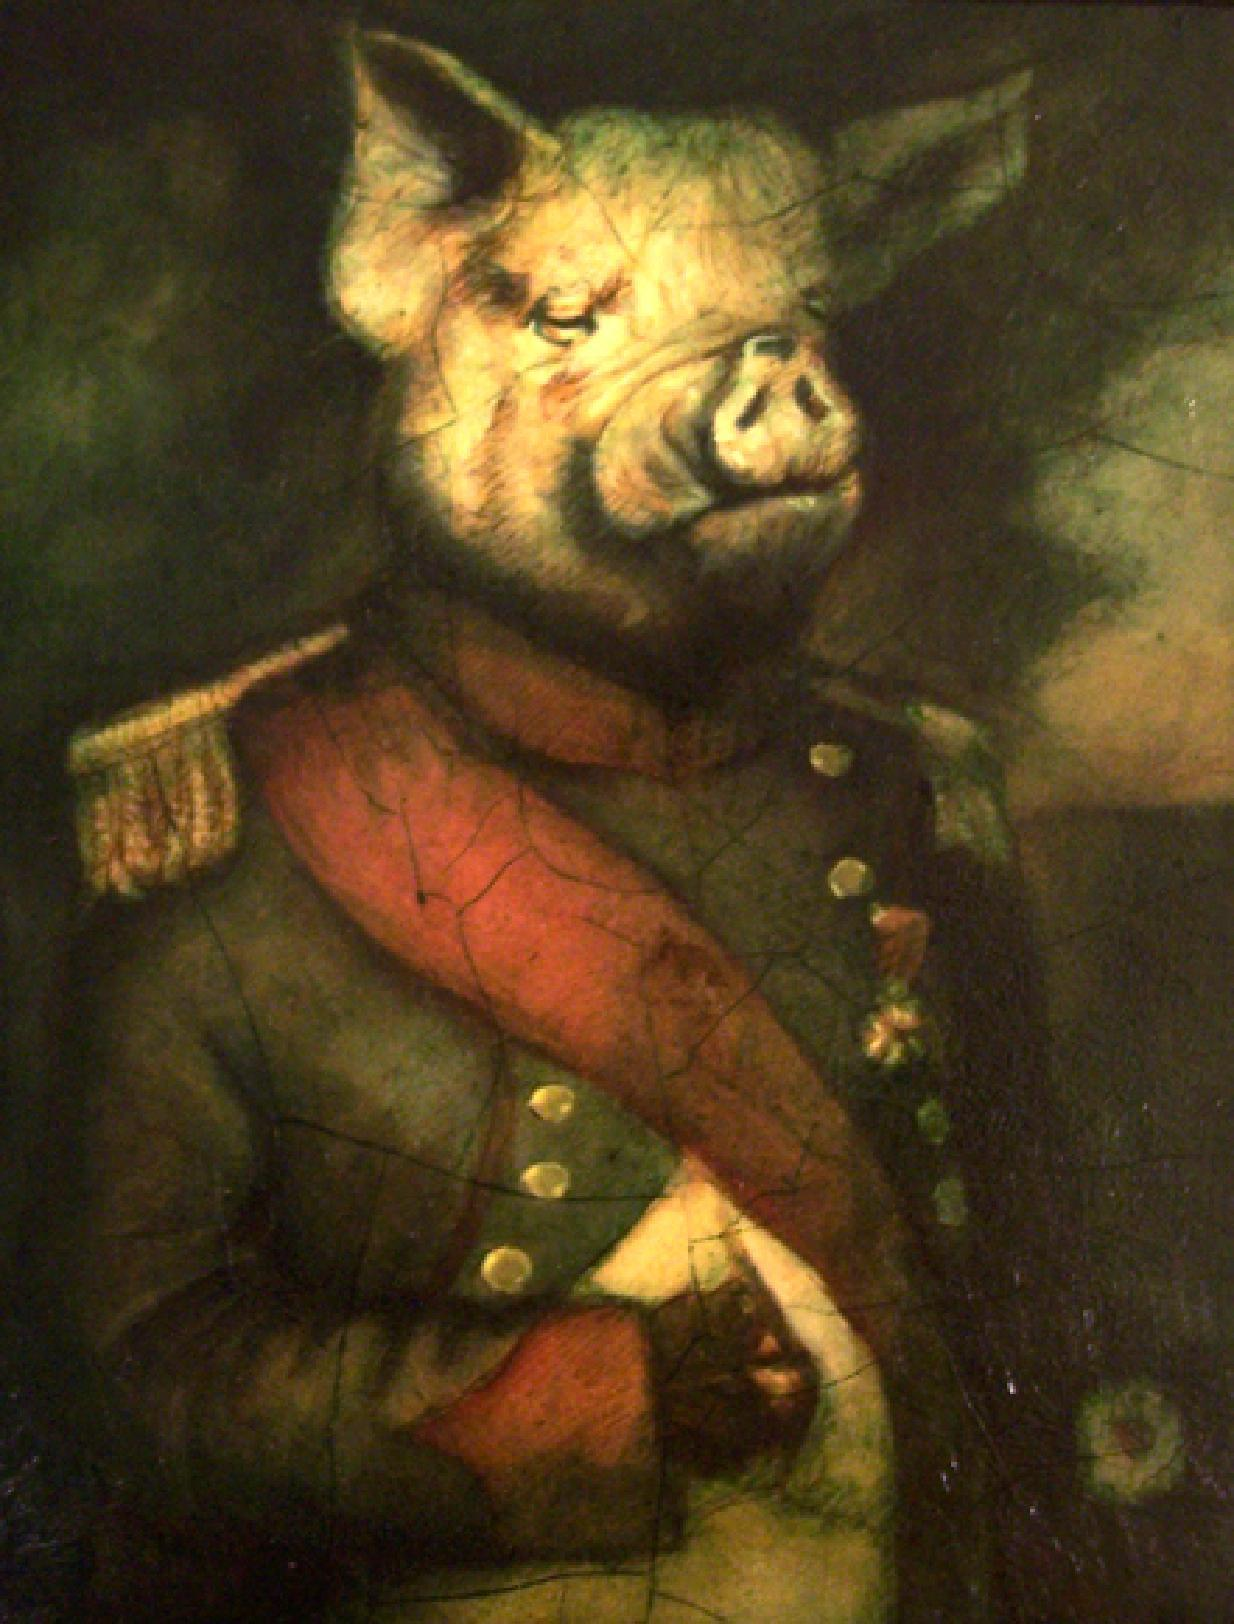 napoleon a pig in animal farm shmoop sparknotes animal farm study questions essay topics